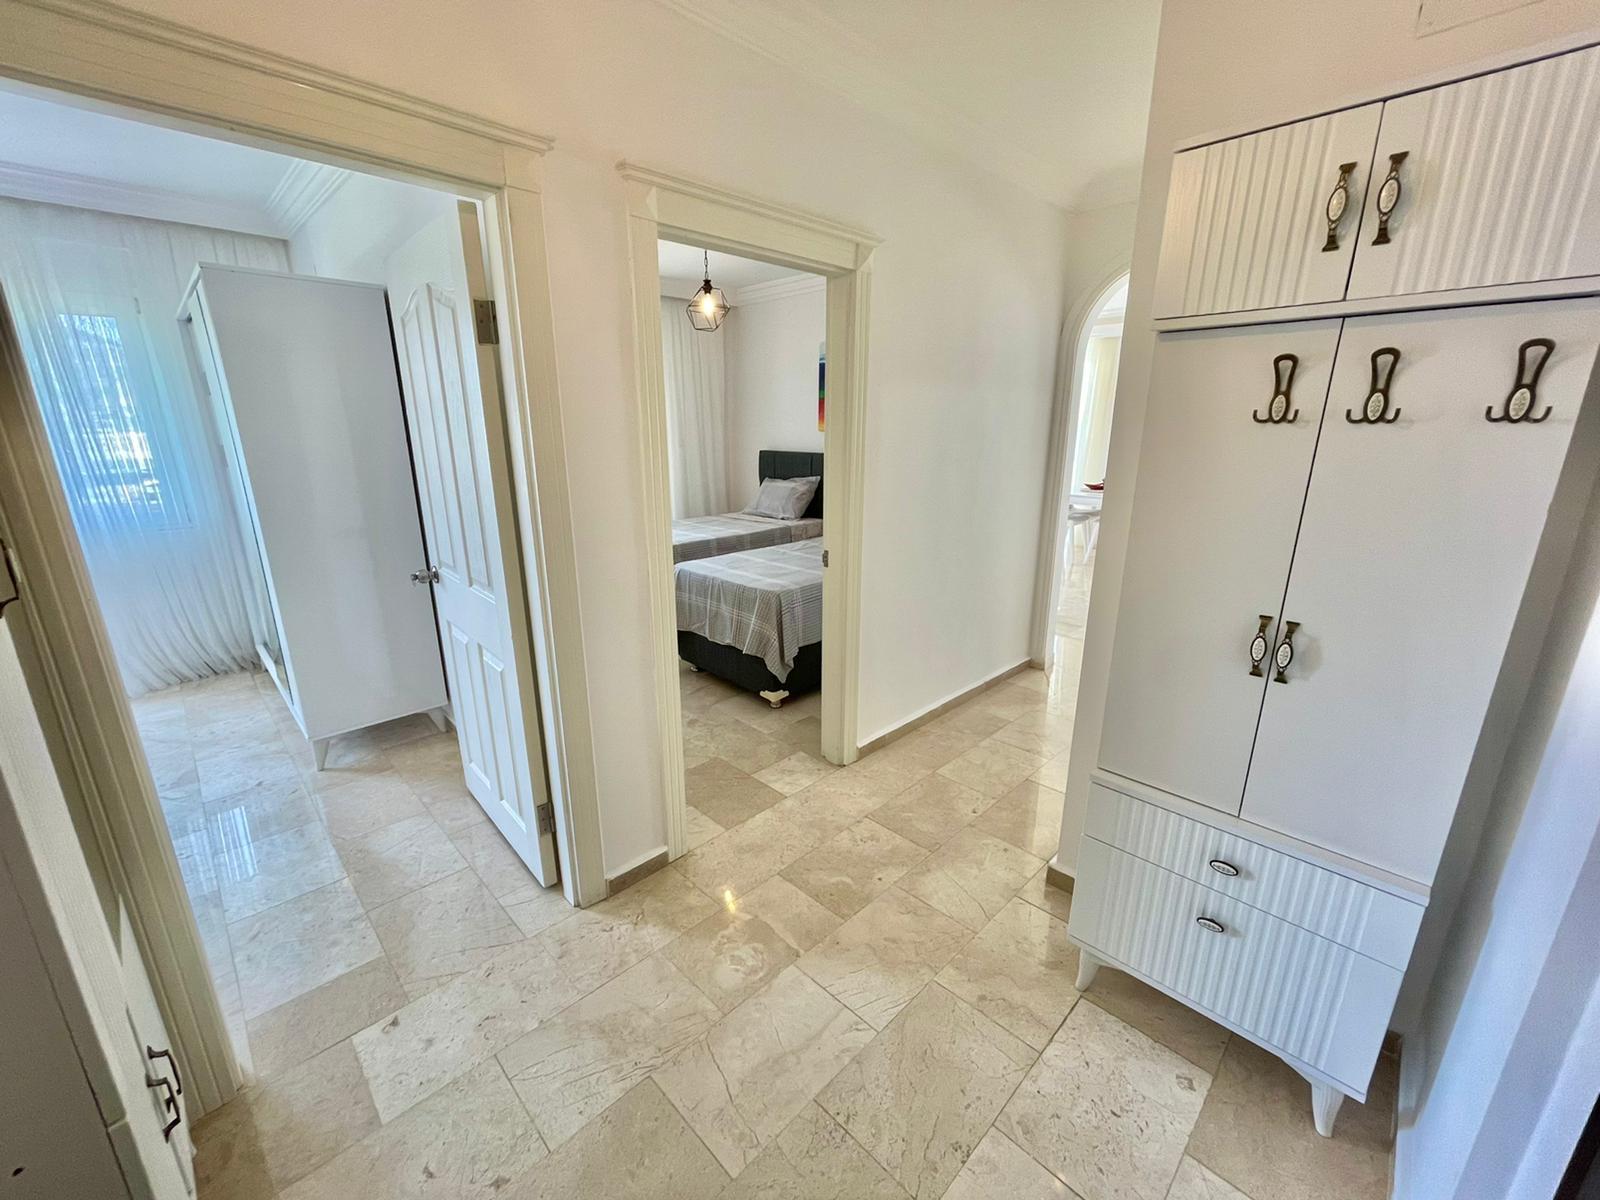 Трёхкомнатная квартира в «двух шагах» от Средиземного моря - Фото 8